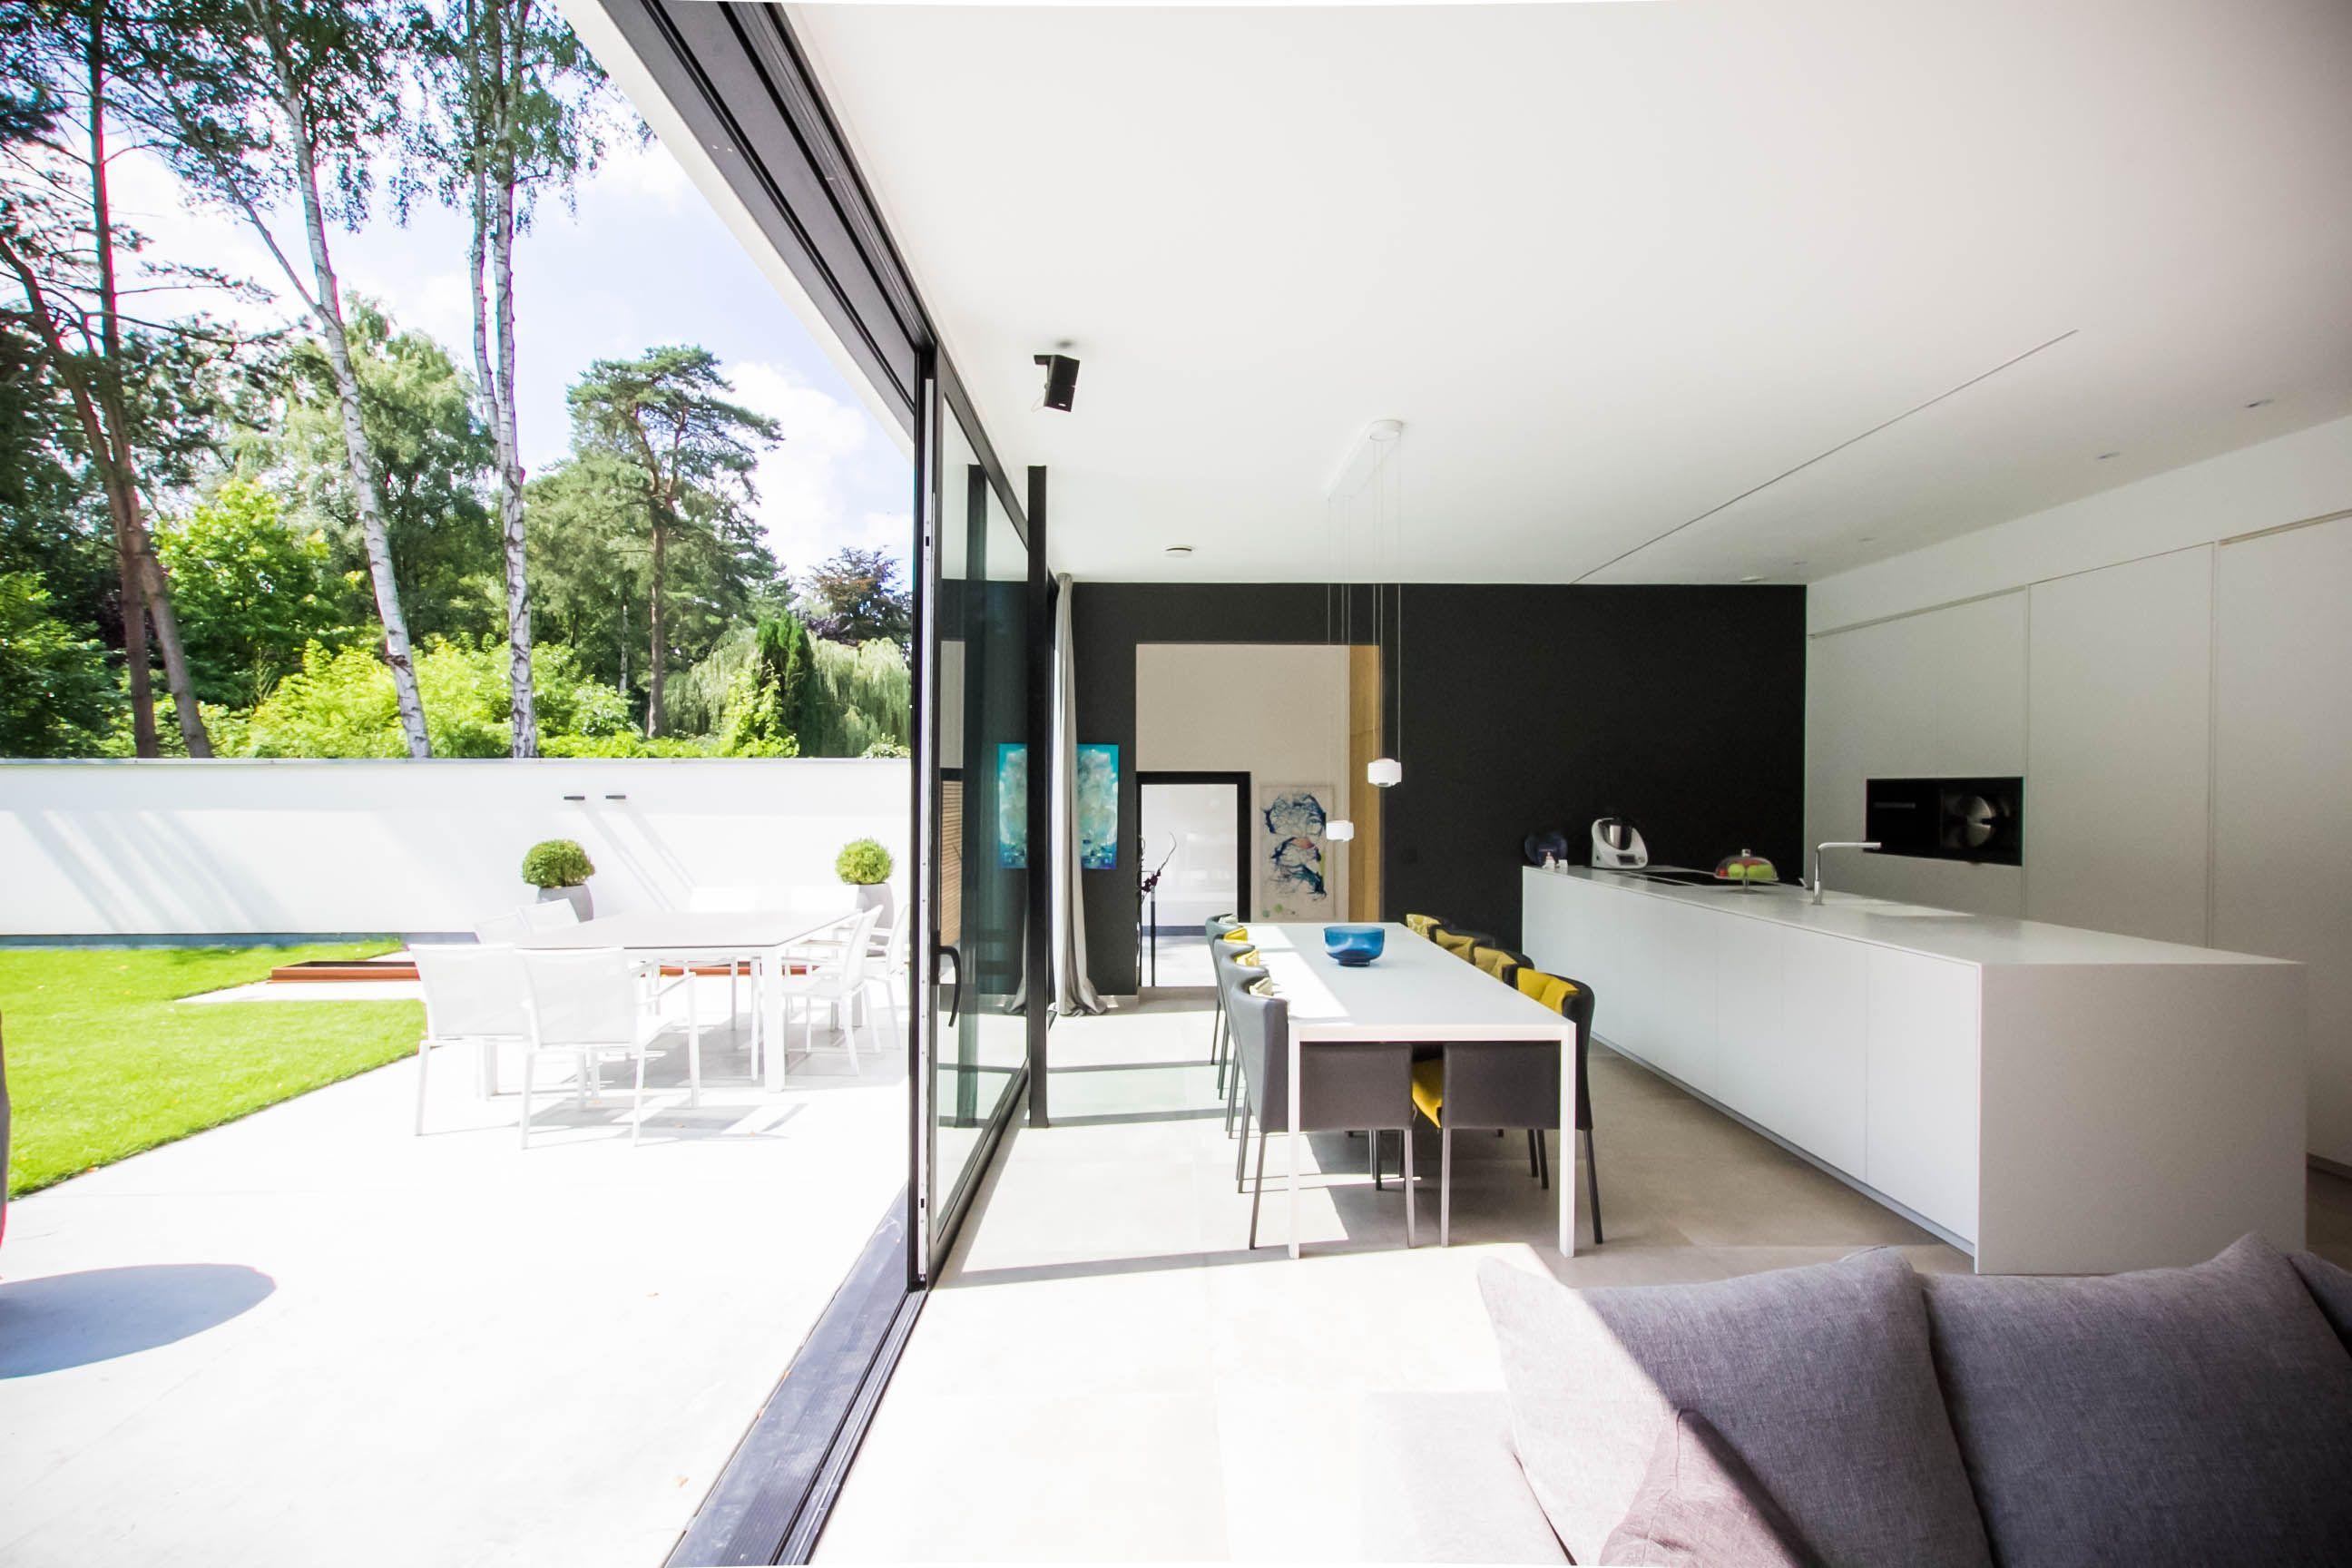 Moderne Open Keukens : Moderne keuken met keukeneiland ruim keukeneiland open keuken